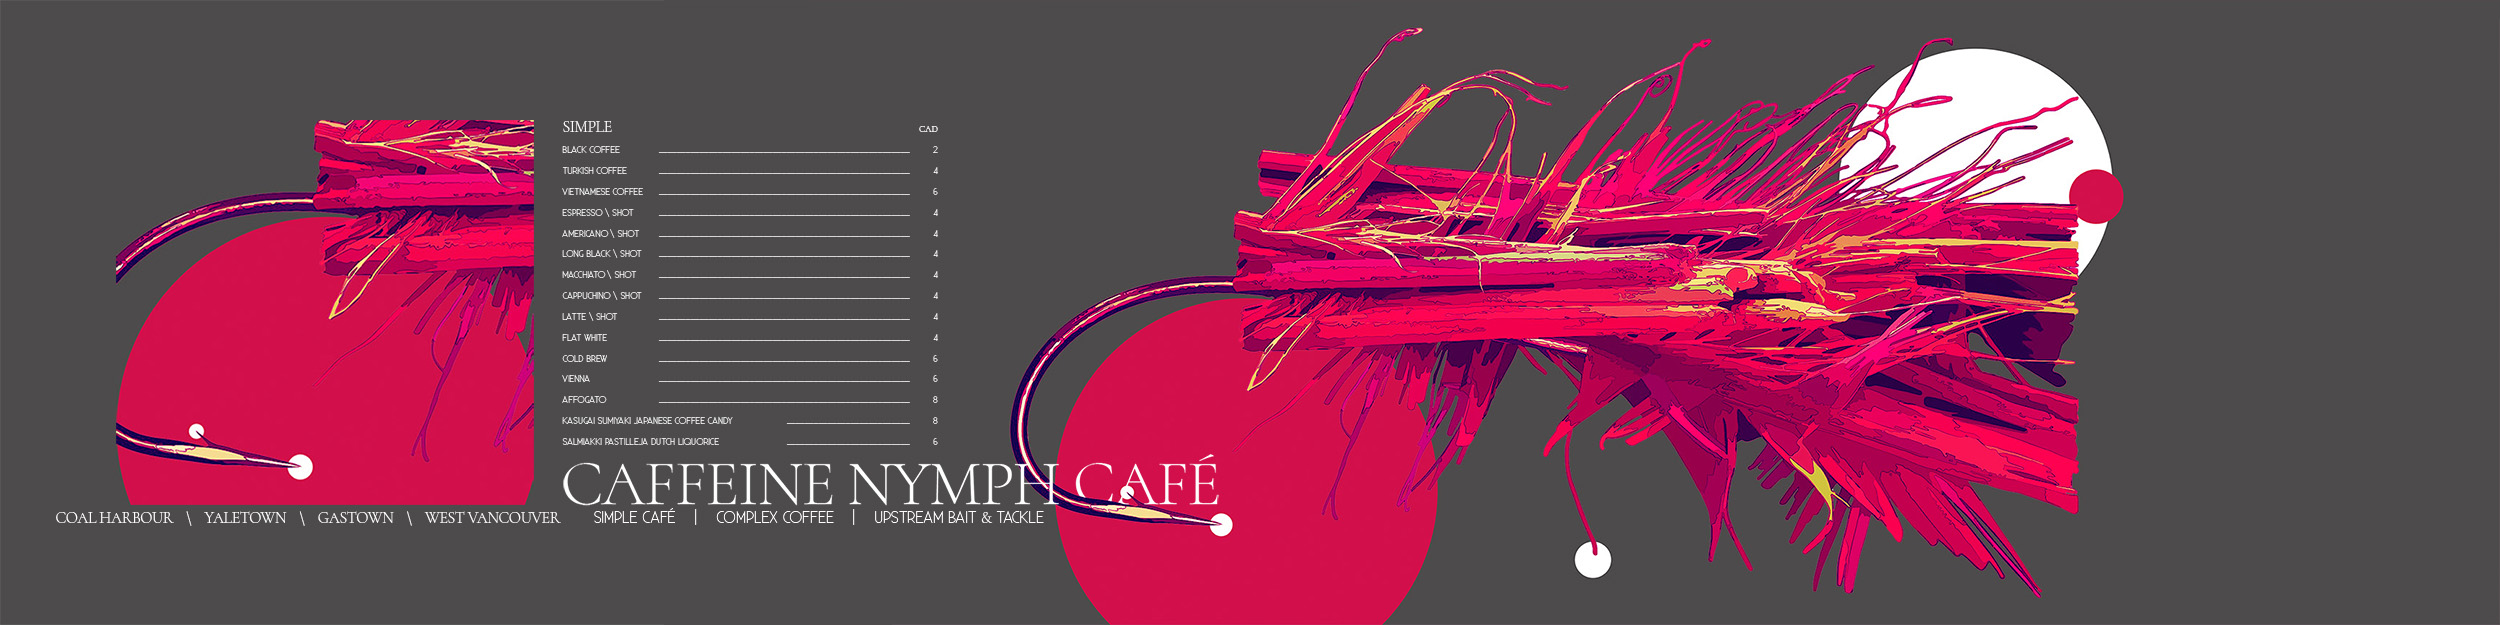 CAFFEINE NYMPH CAFE YVR MENU.jpg